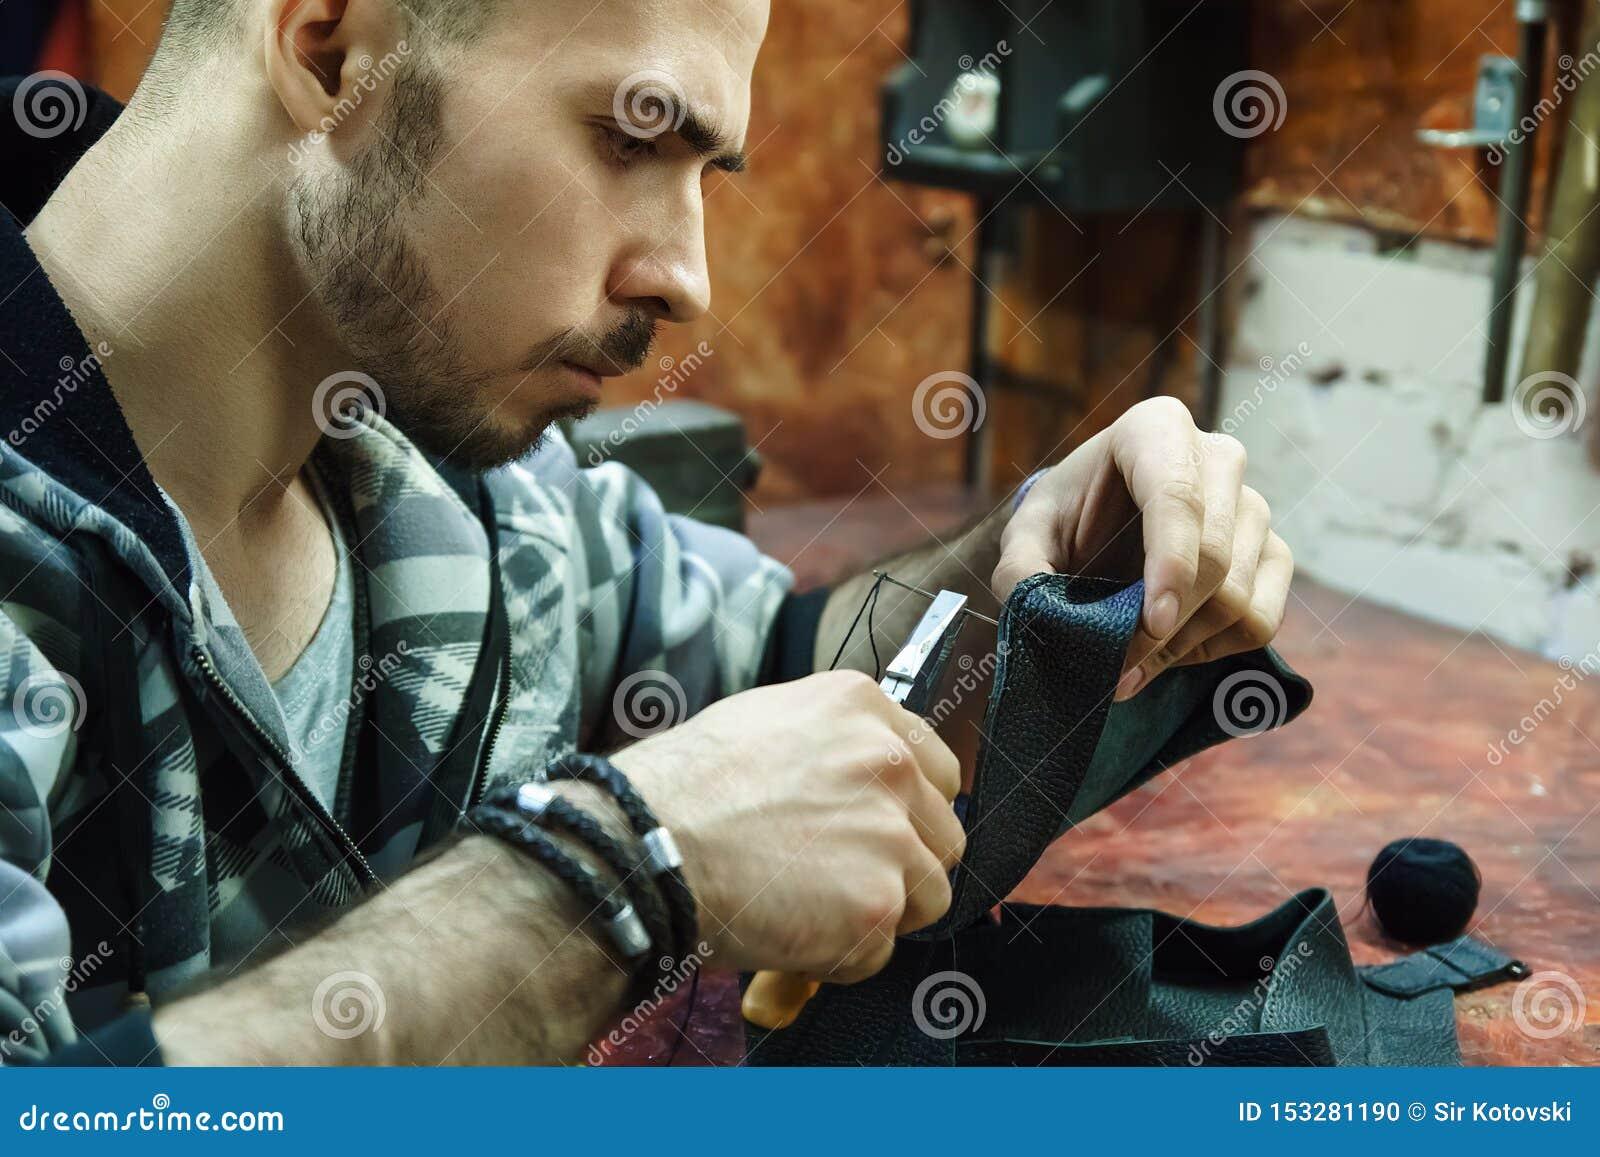 Tanner sews leather item in workshop.